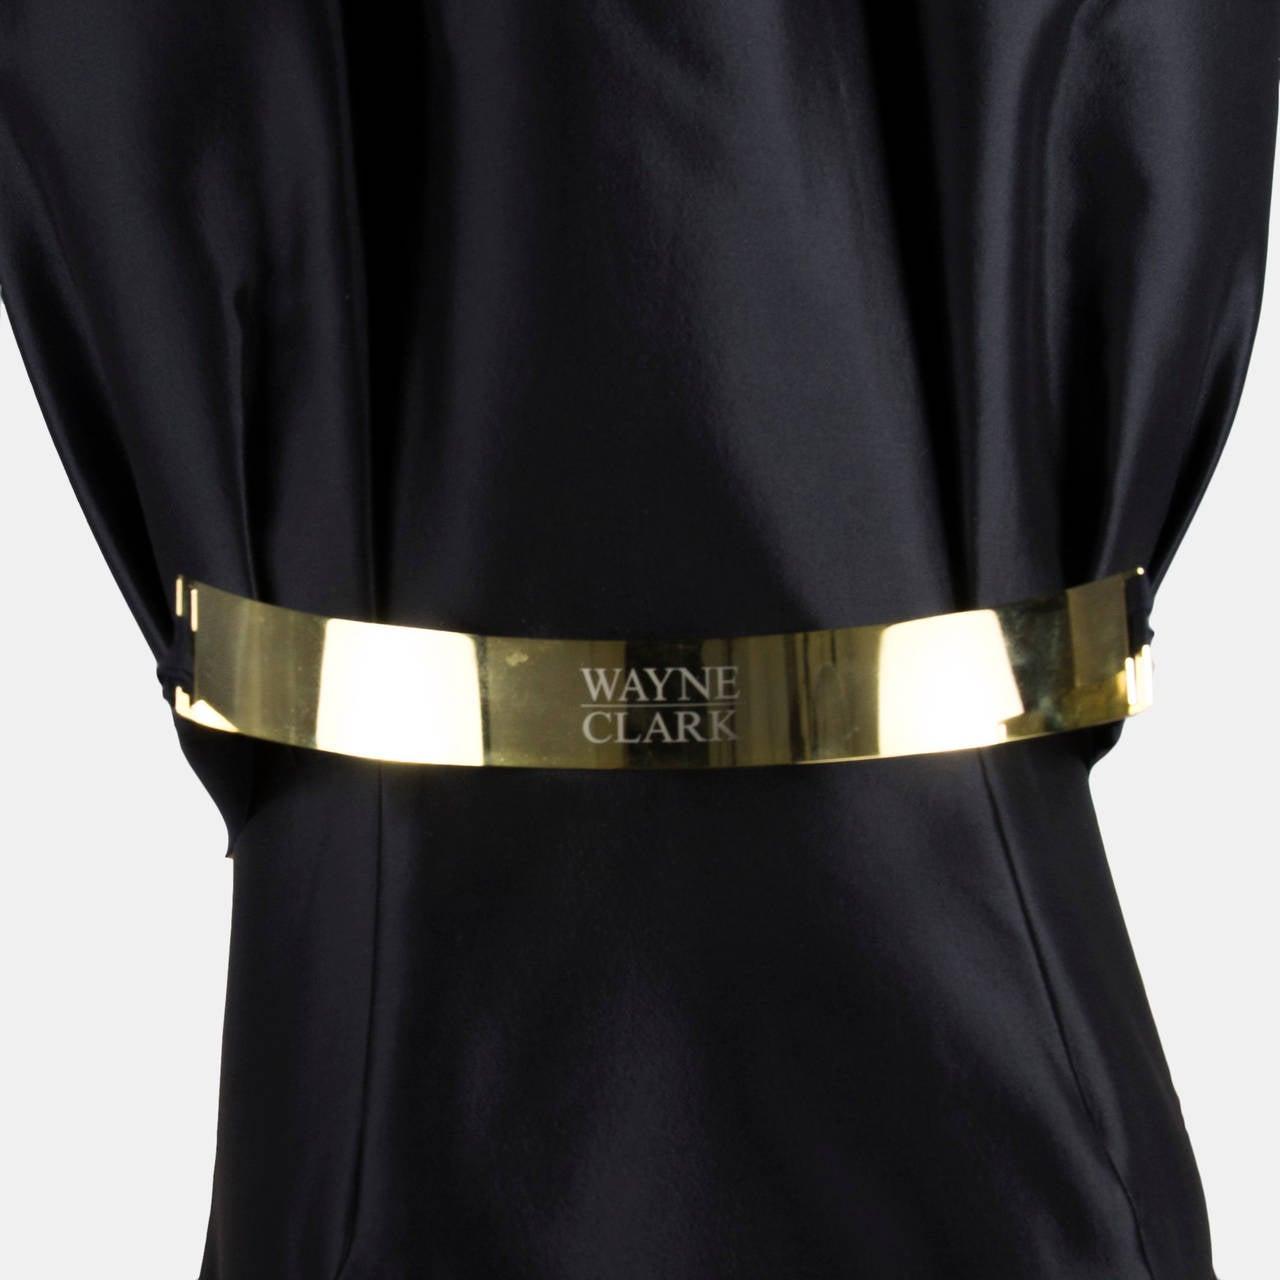 Wayne Clark Black Gold Belted Gown For Sale 5